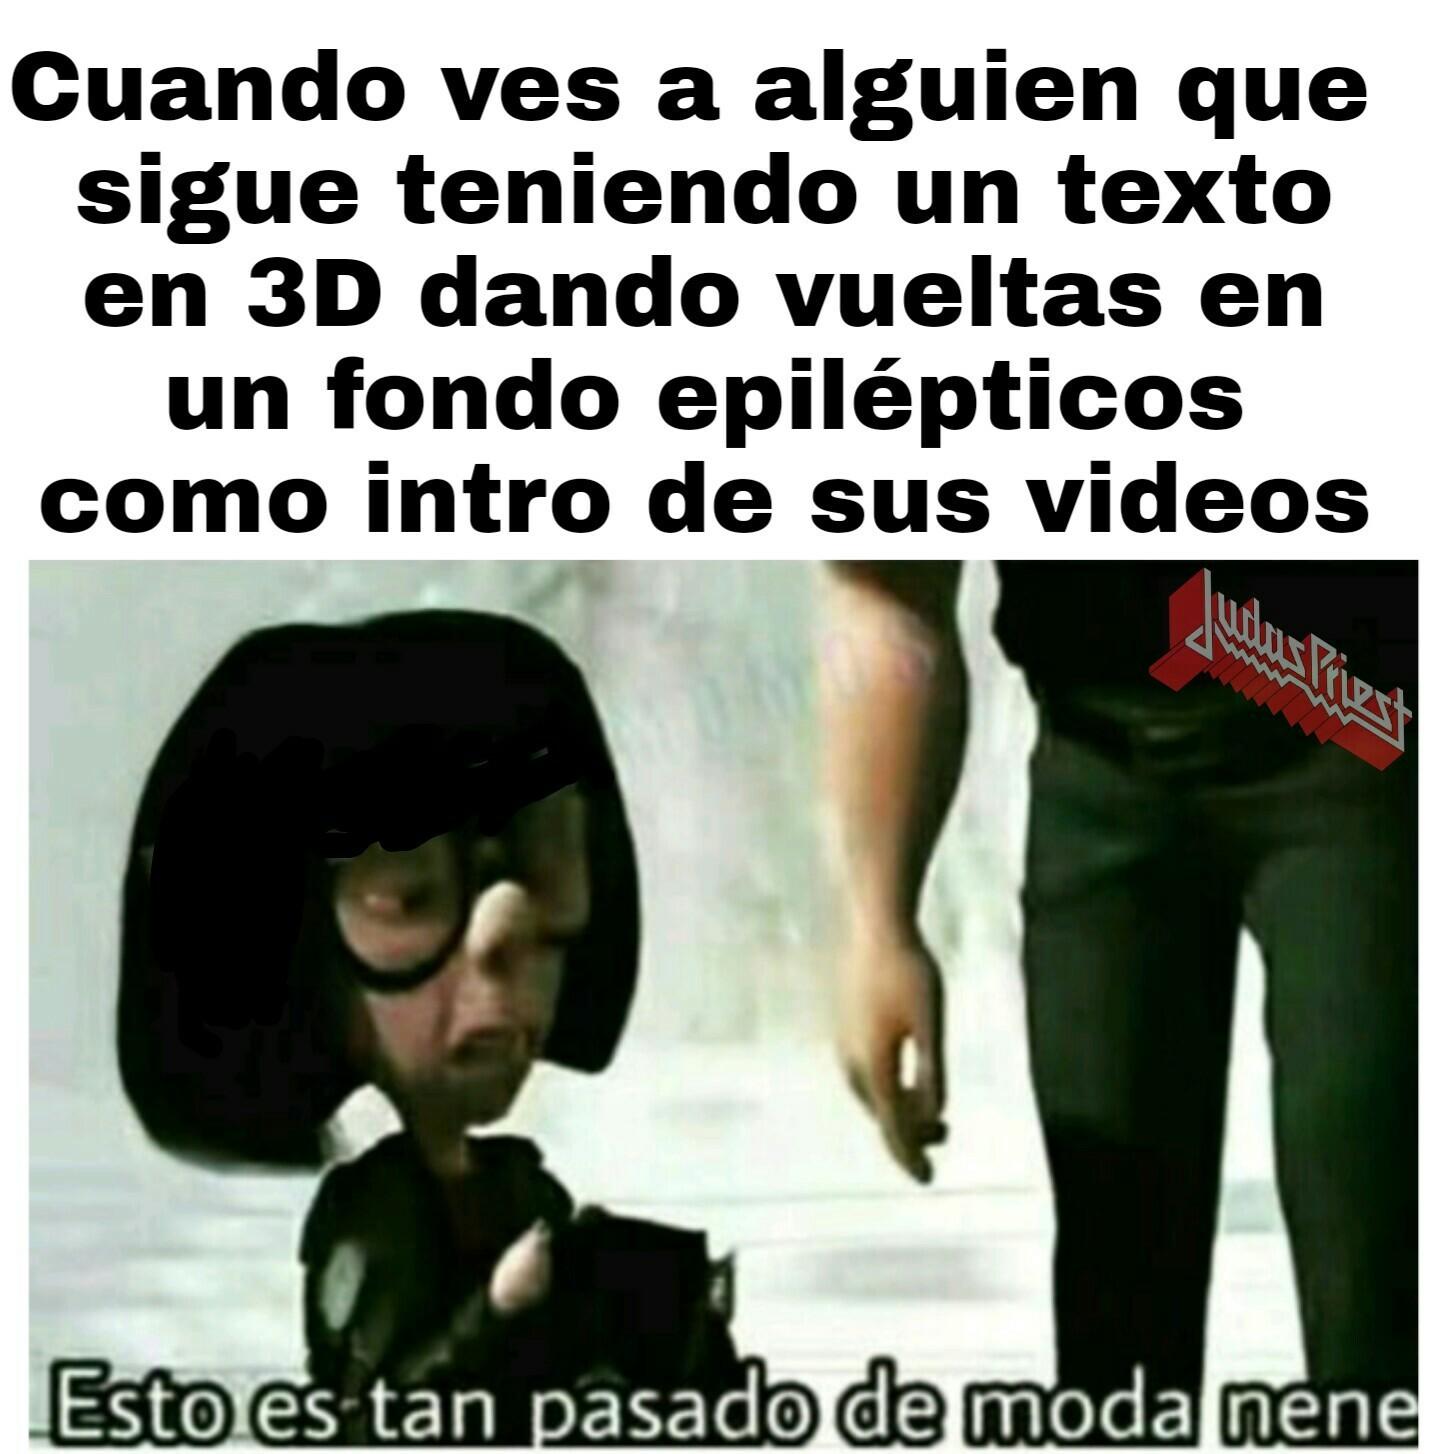 Stos youtubers poco originales - meme